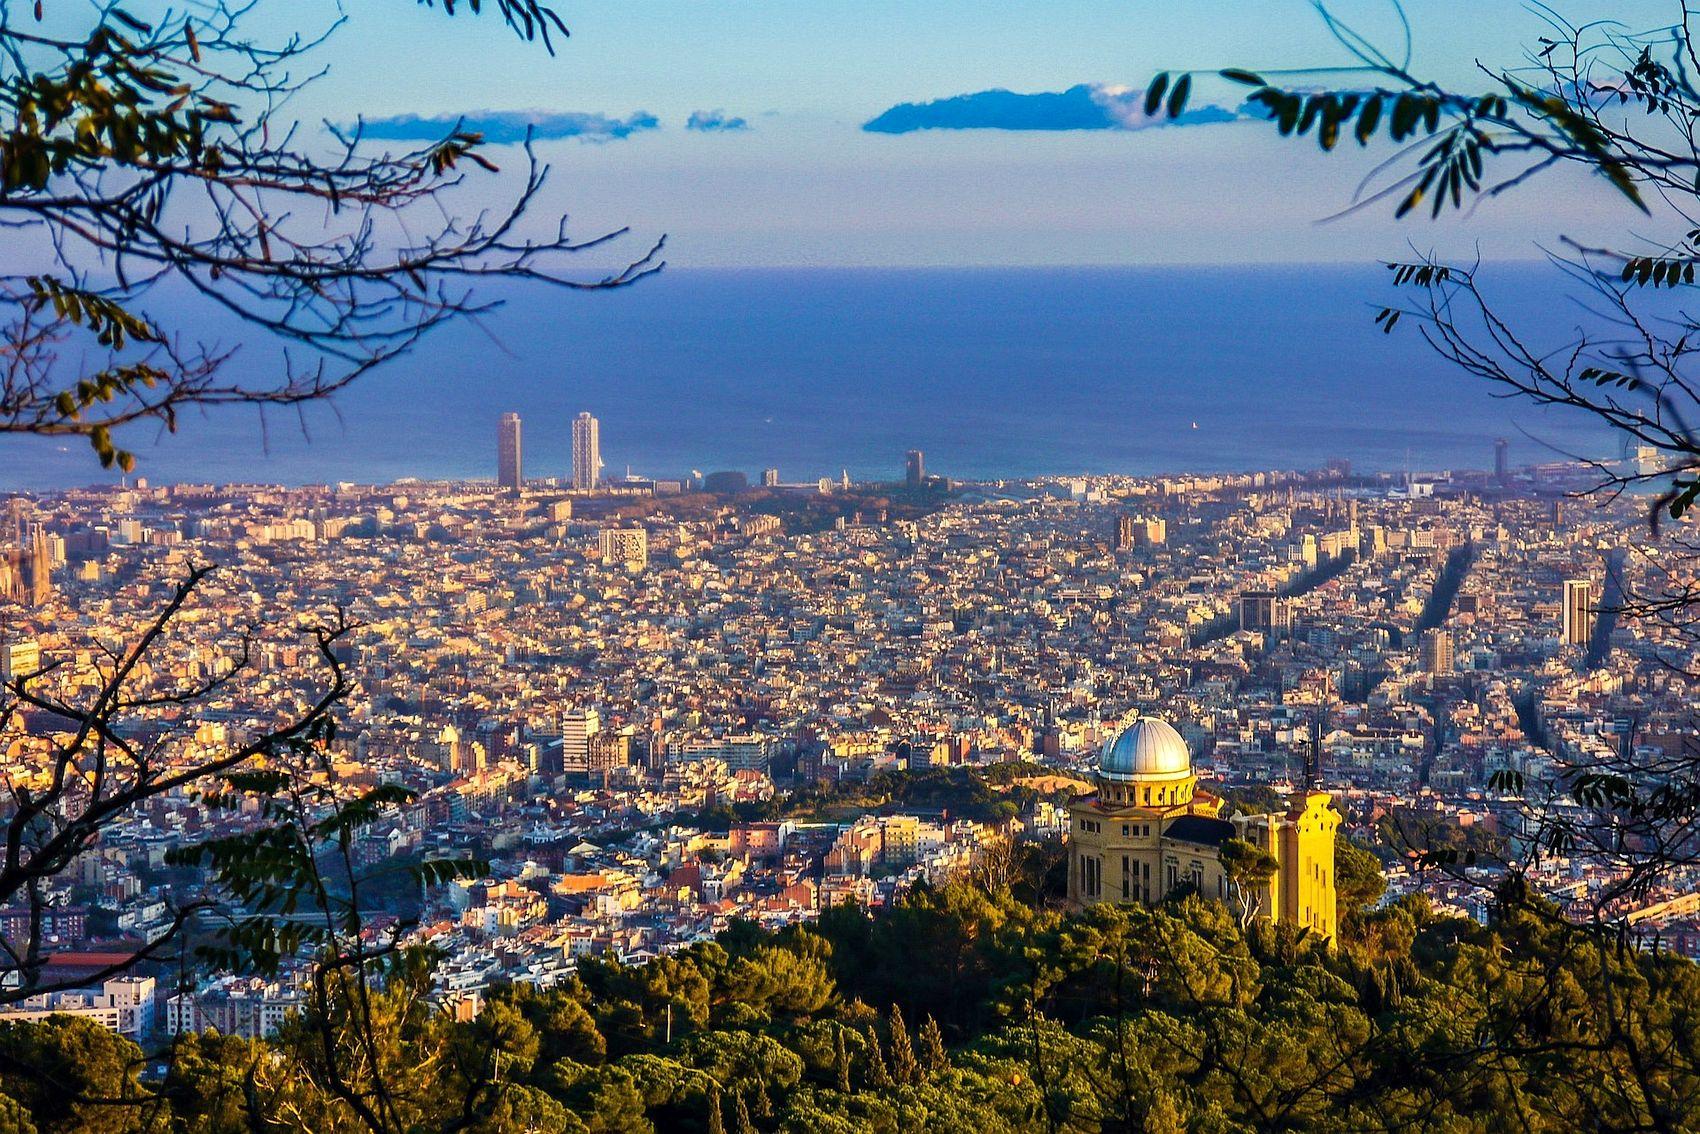 Barcelona seen from Collserola